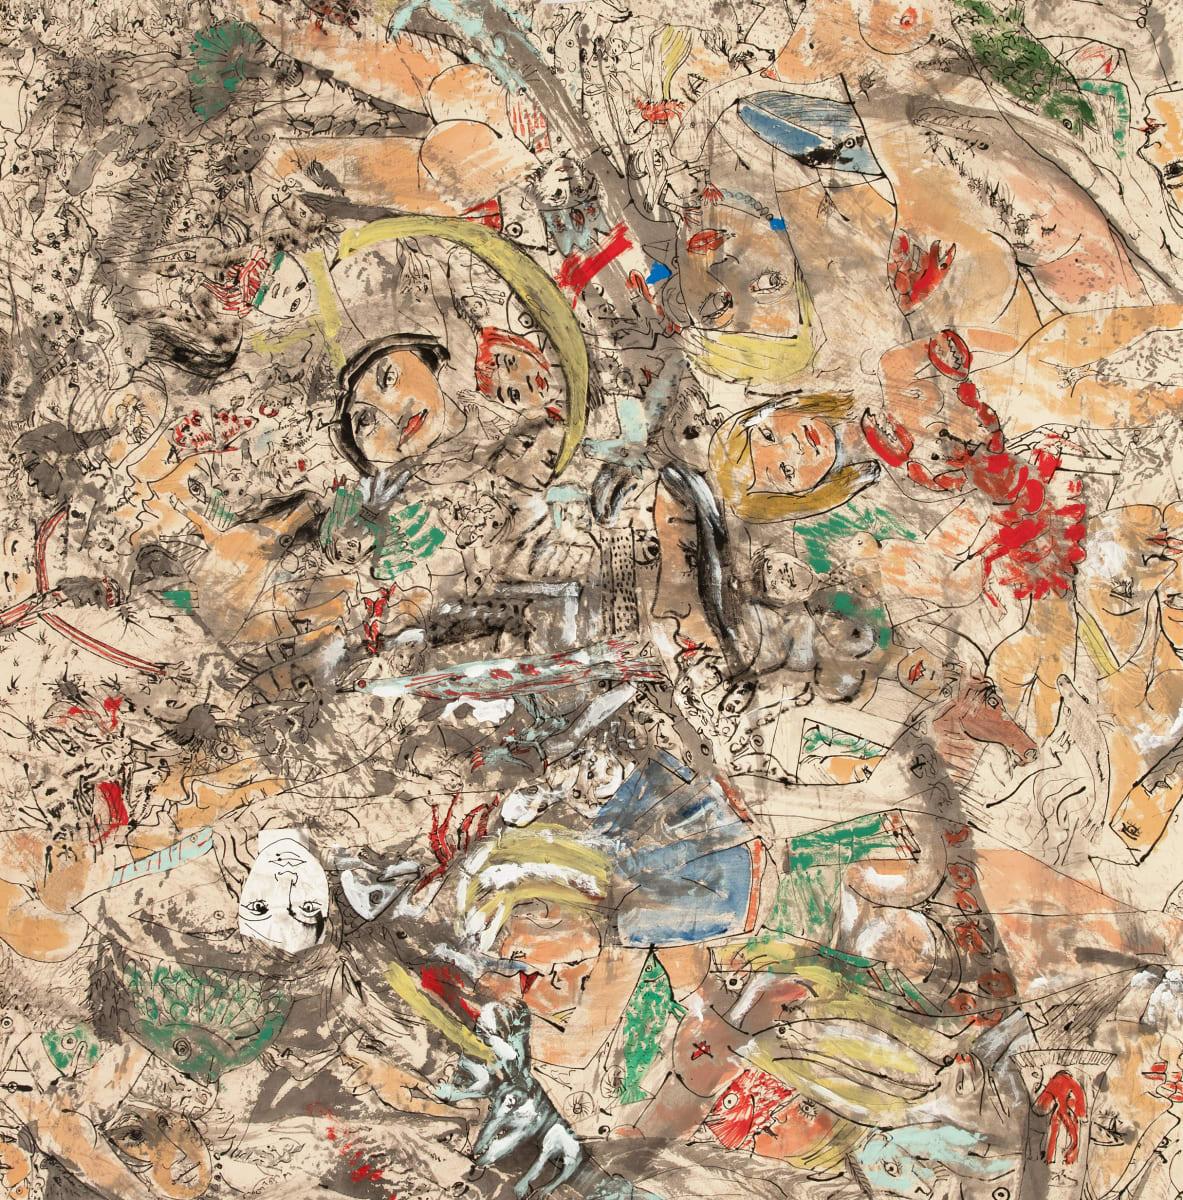 Knox Martin: Homage to Goya